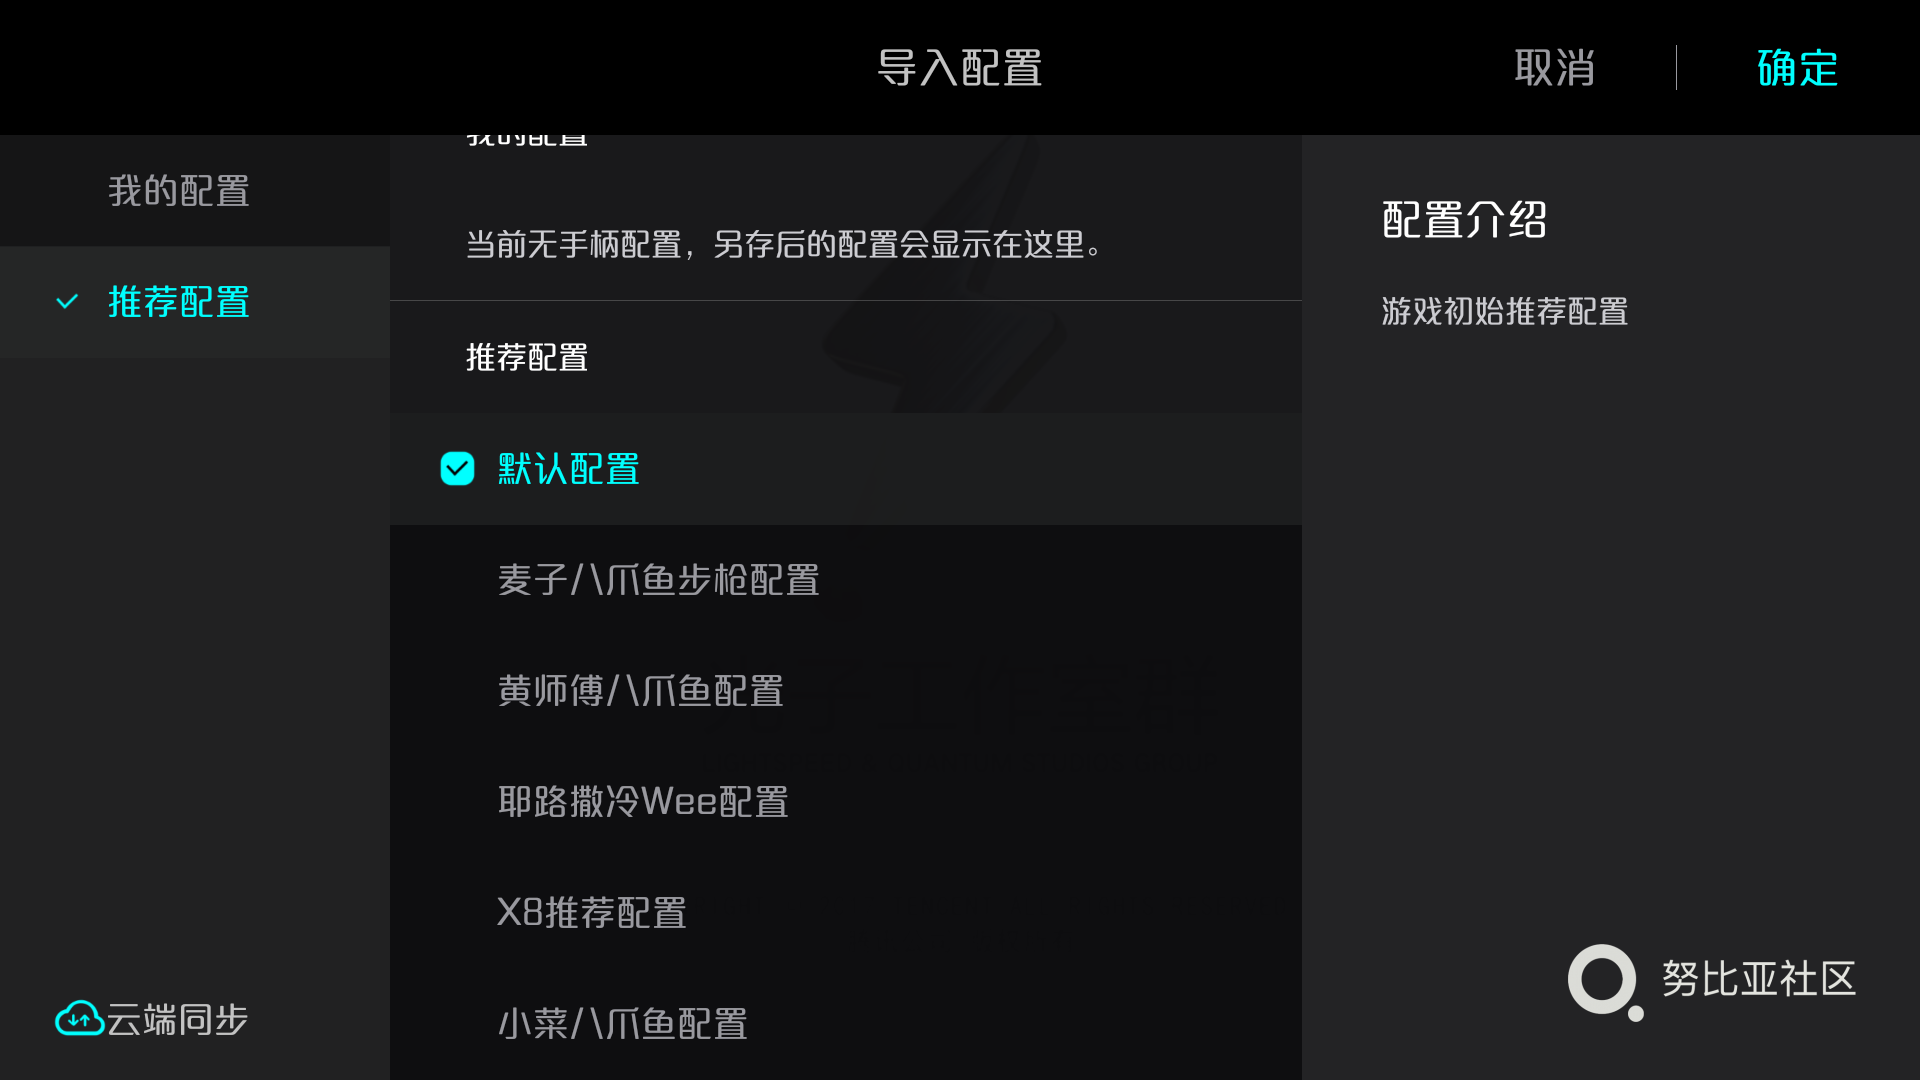 Screenshot_2018-06-10-01-10-41.png